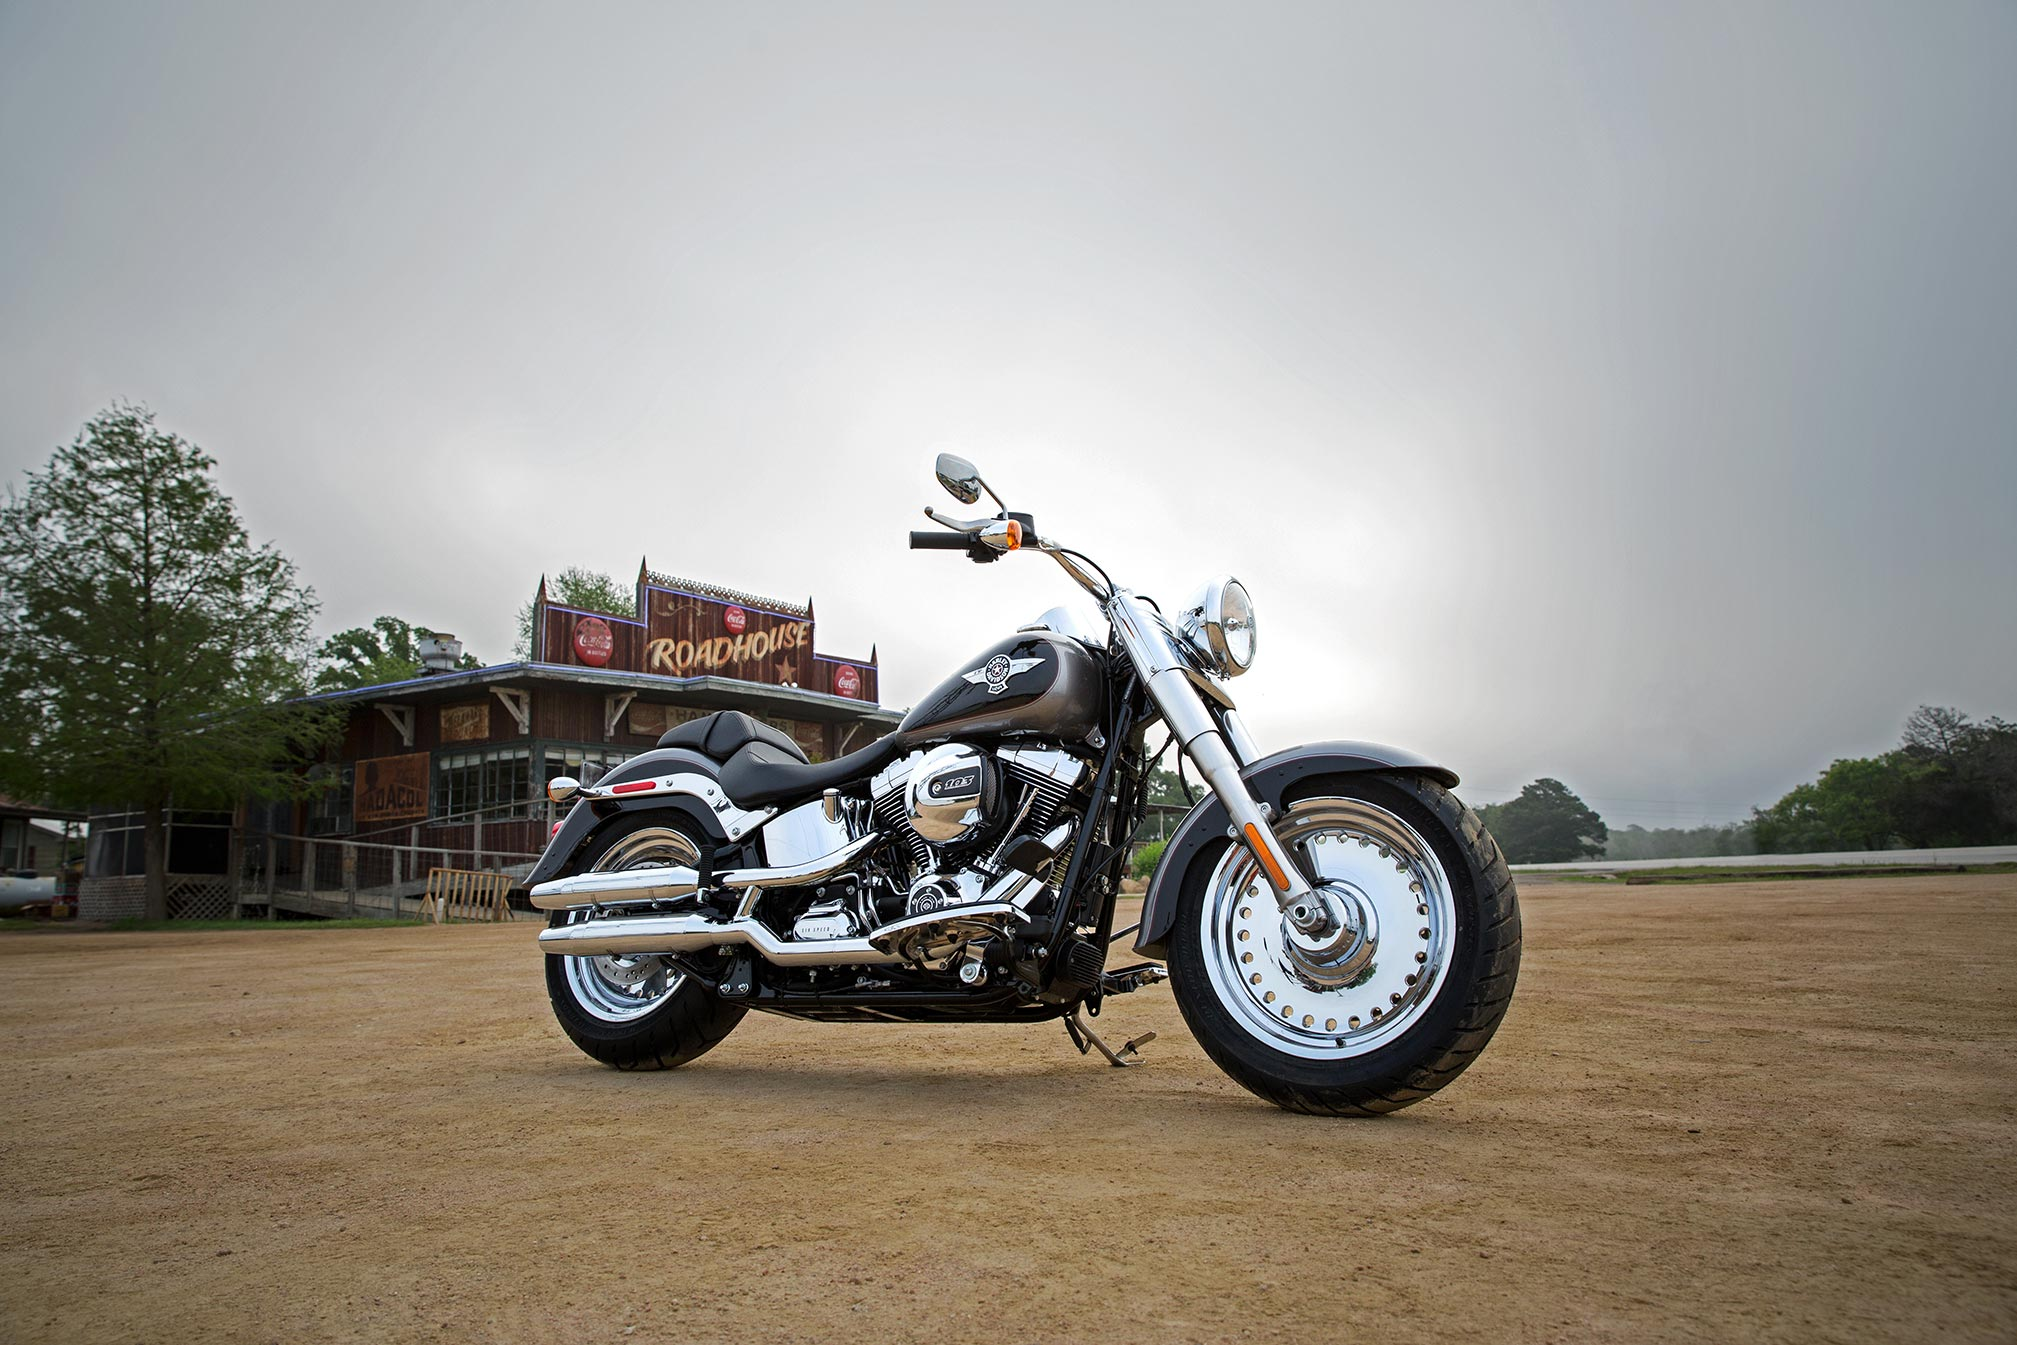 2017 Harley-Davidson Fat Boy HD Wallpaper